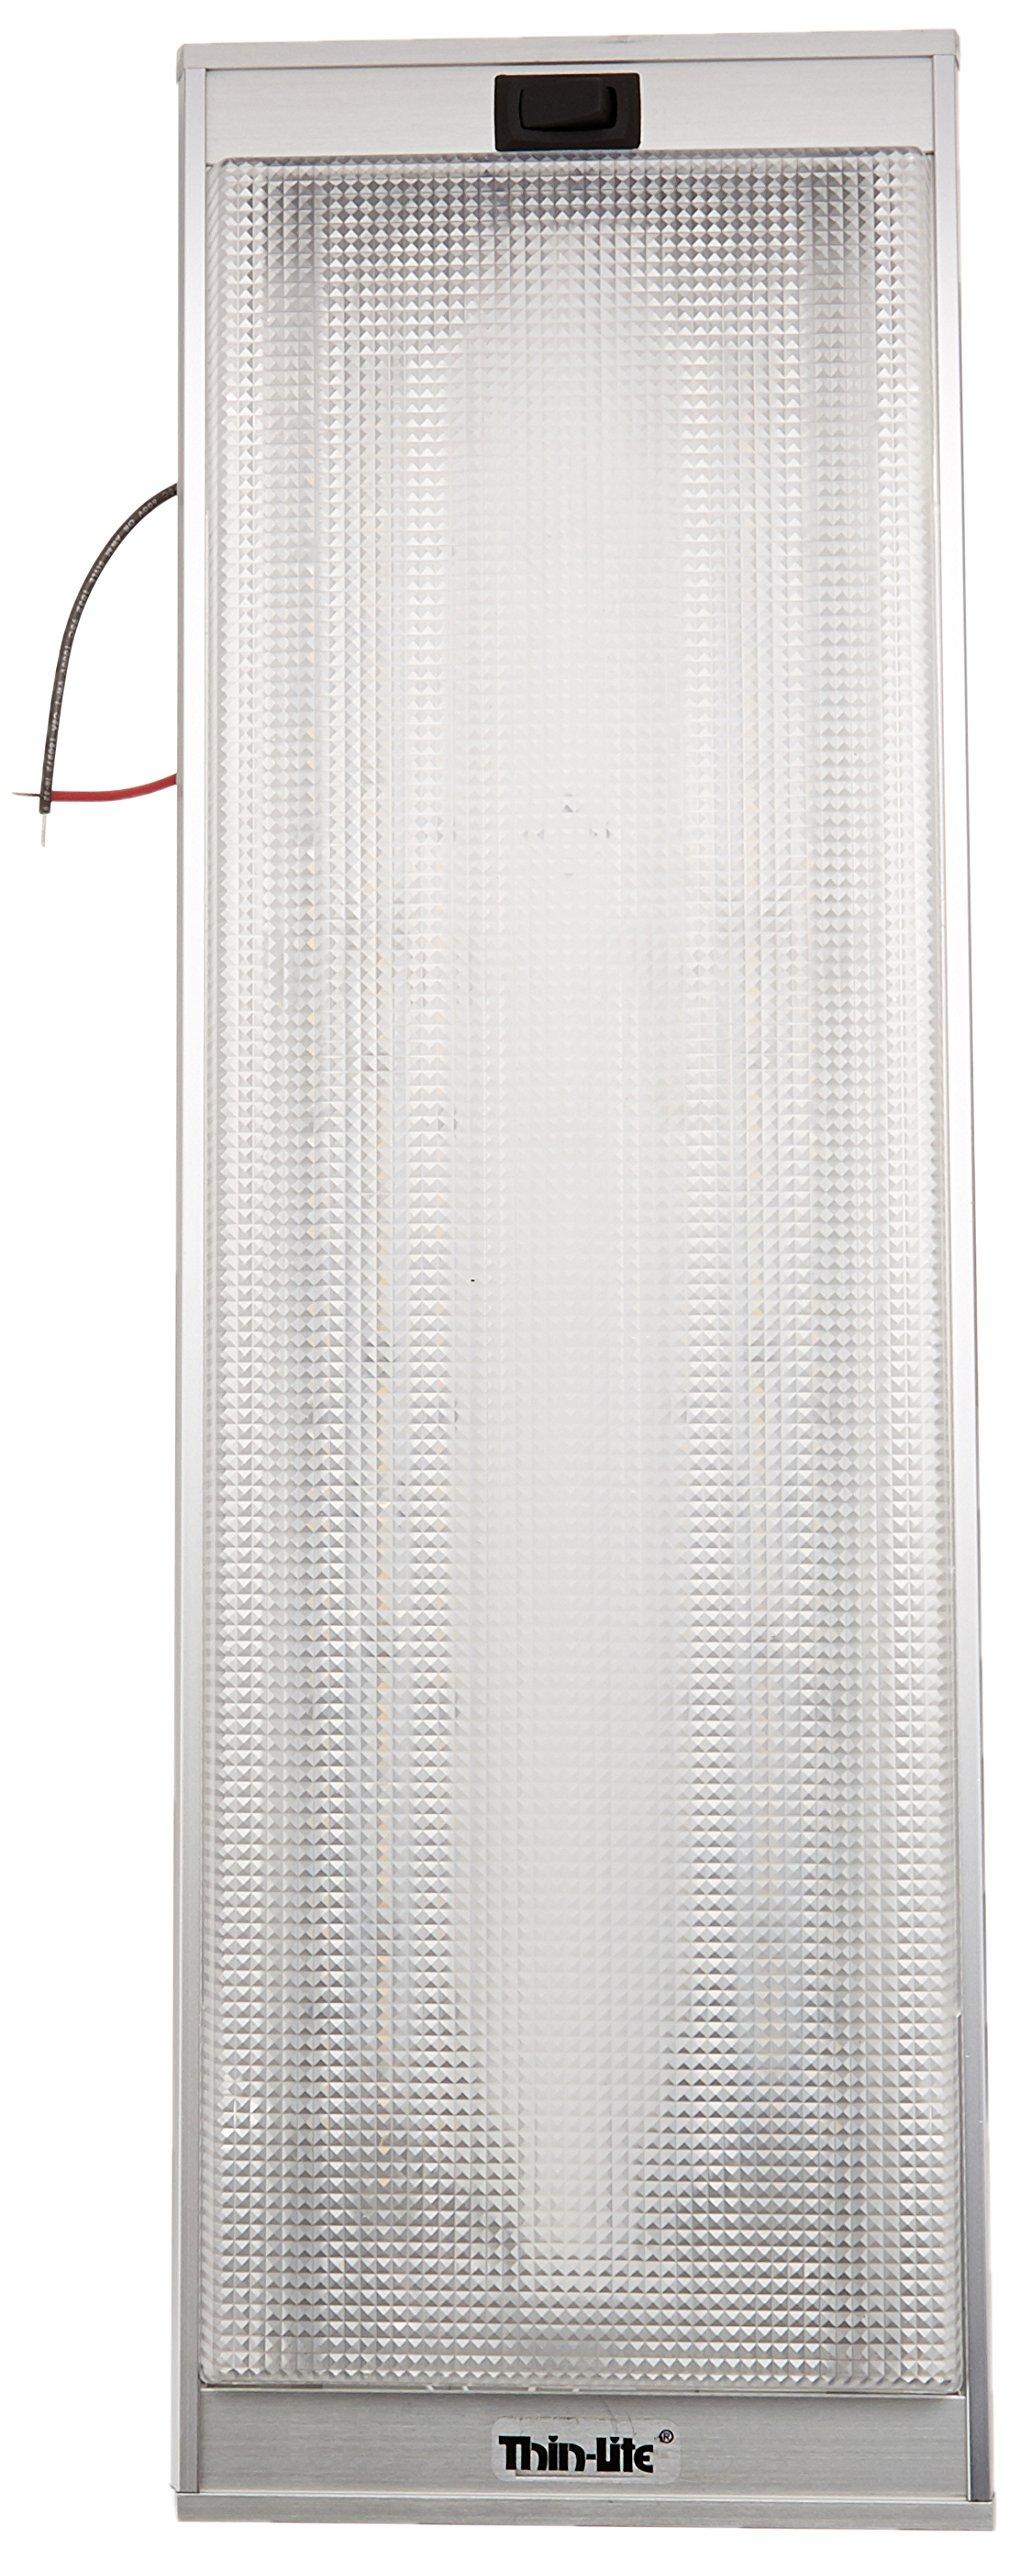 Thin-Lite Corp LED716XLP #716Xlp 72 Led 15Watt